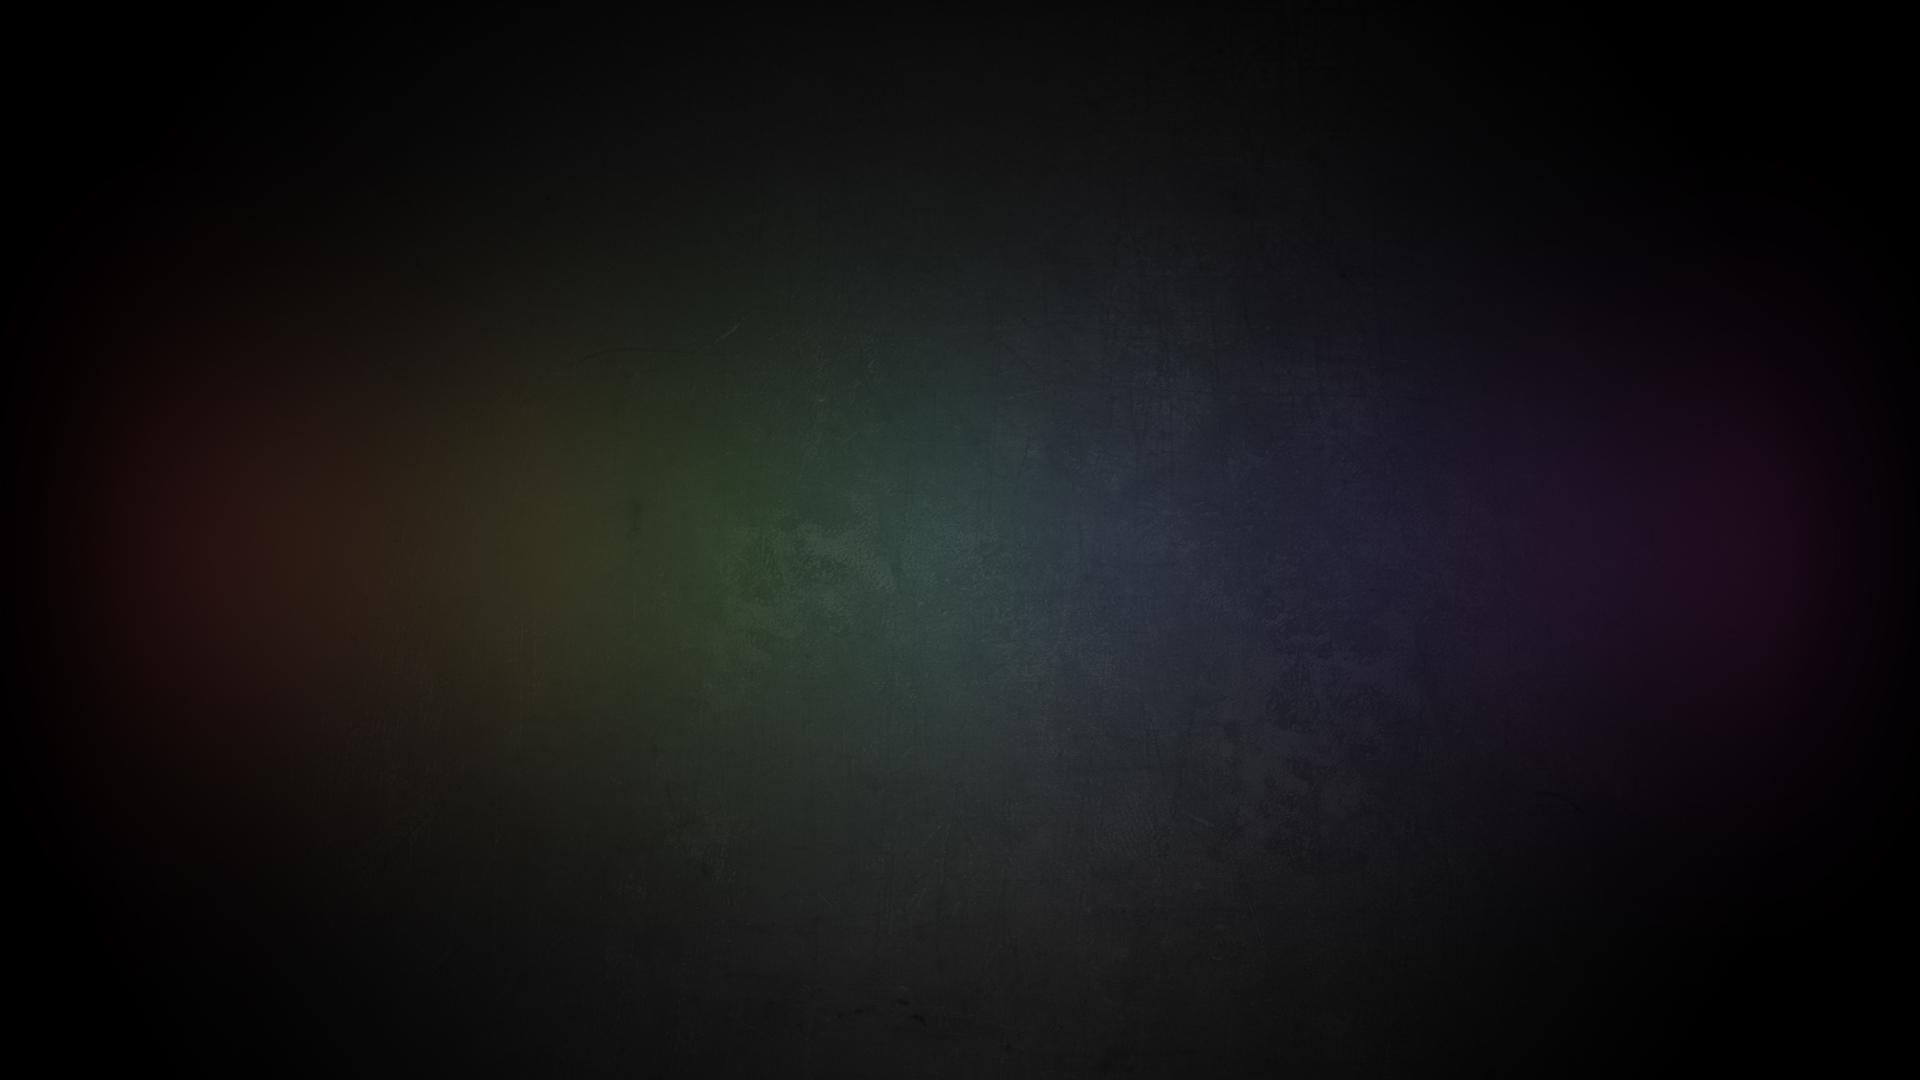 Black color Love Wallpaper : Dark Background 46615 1920x1080 px ~ HDWallSource.com